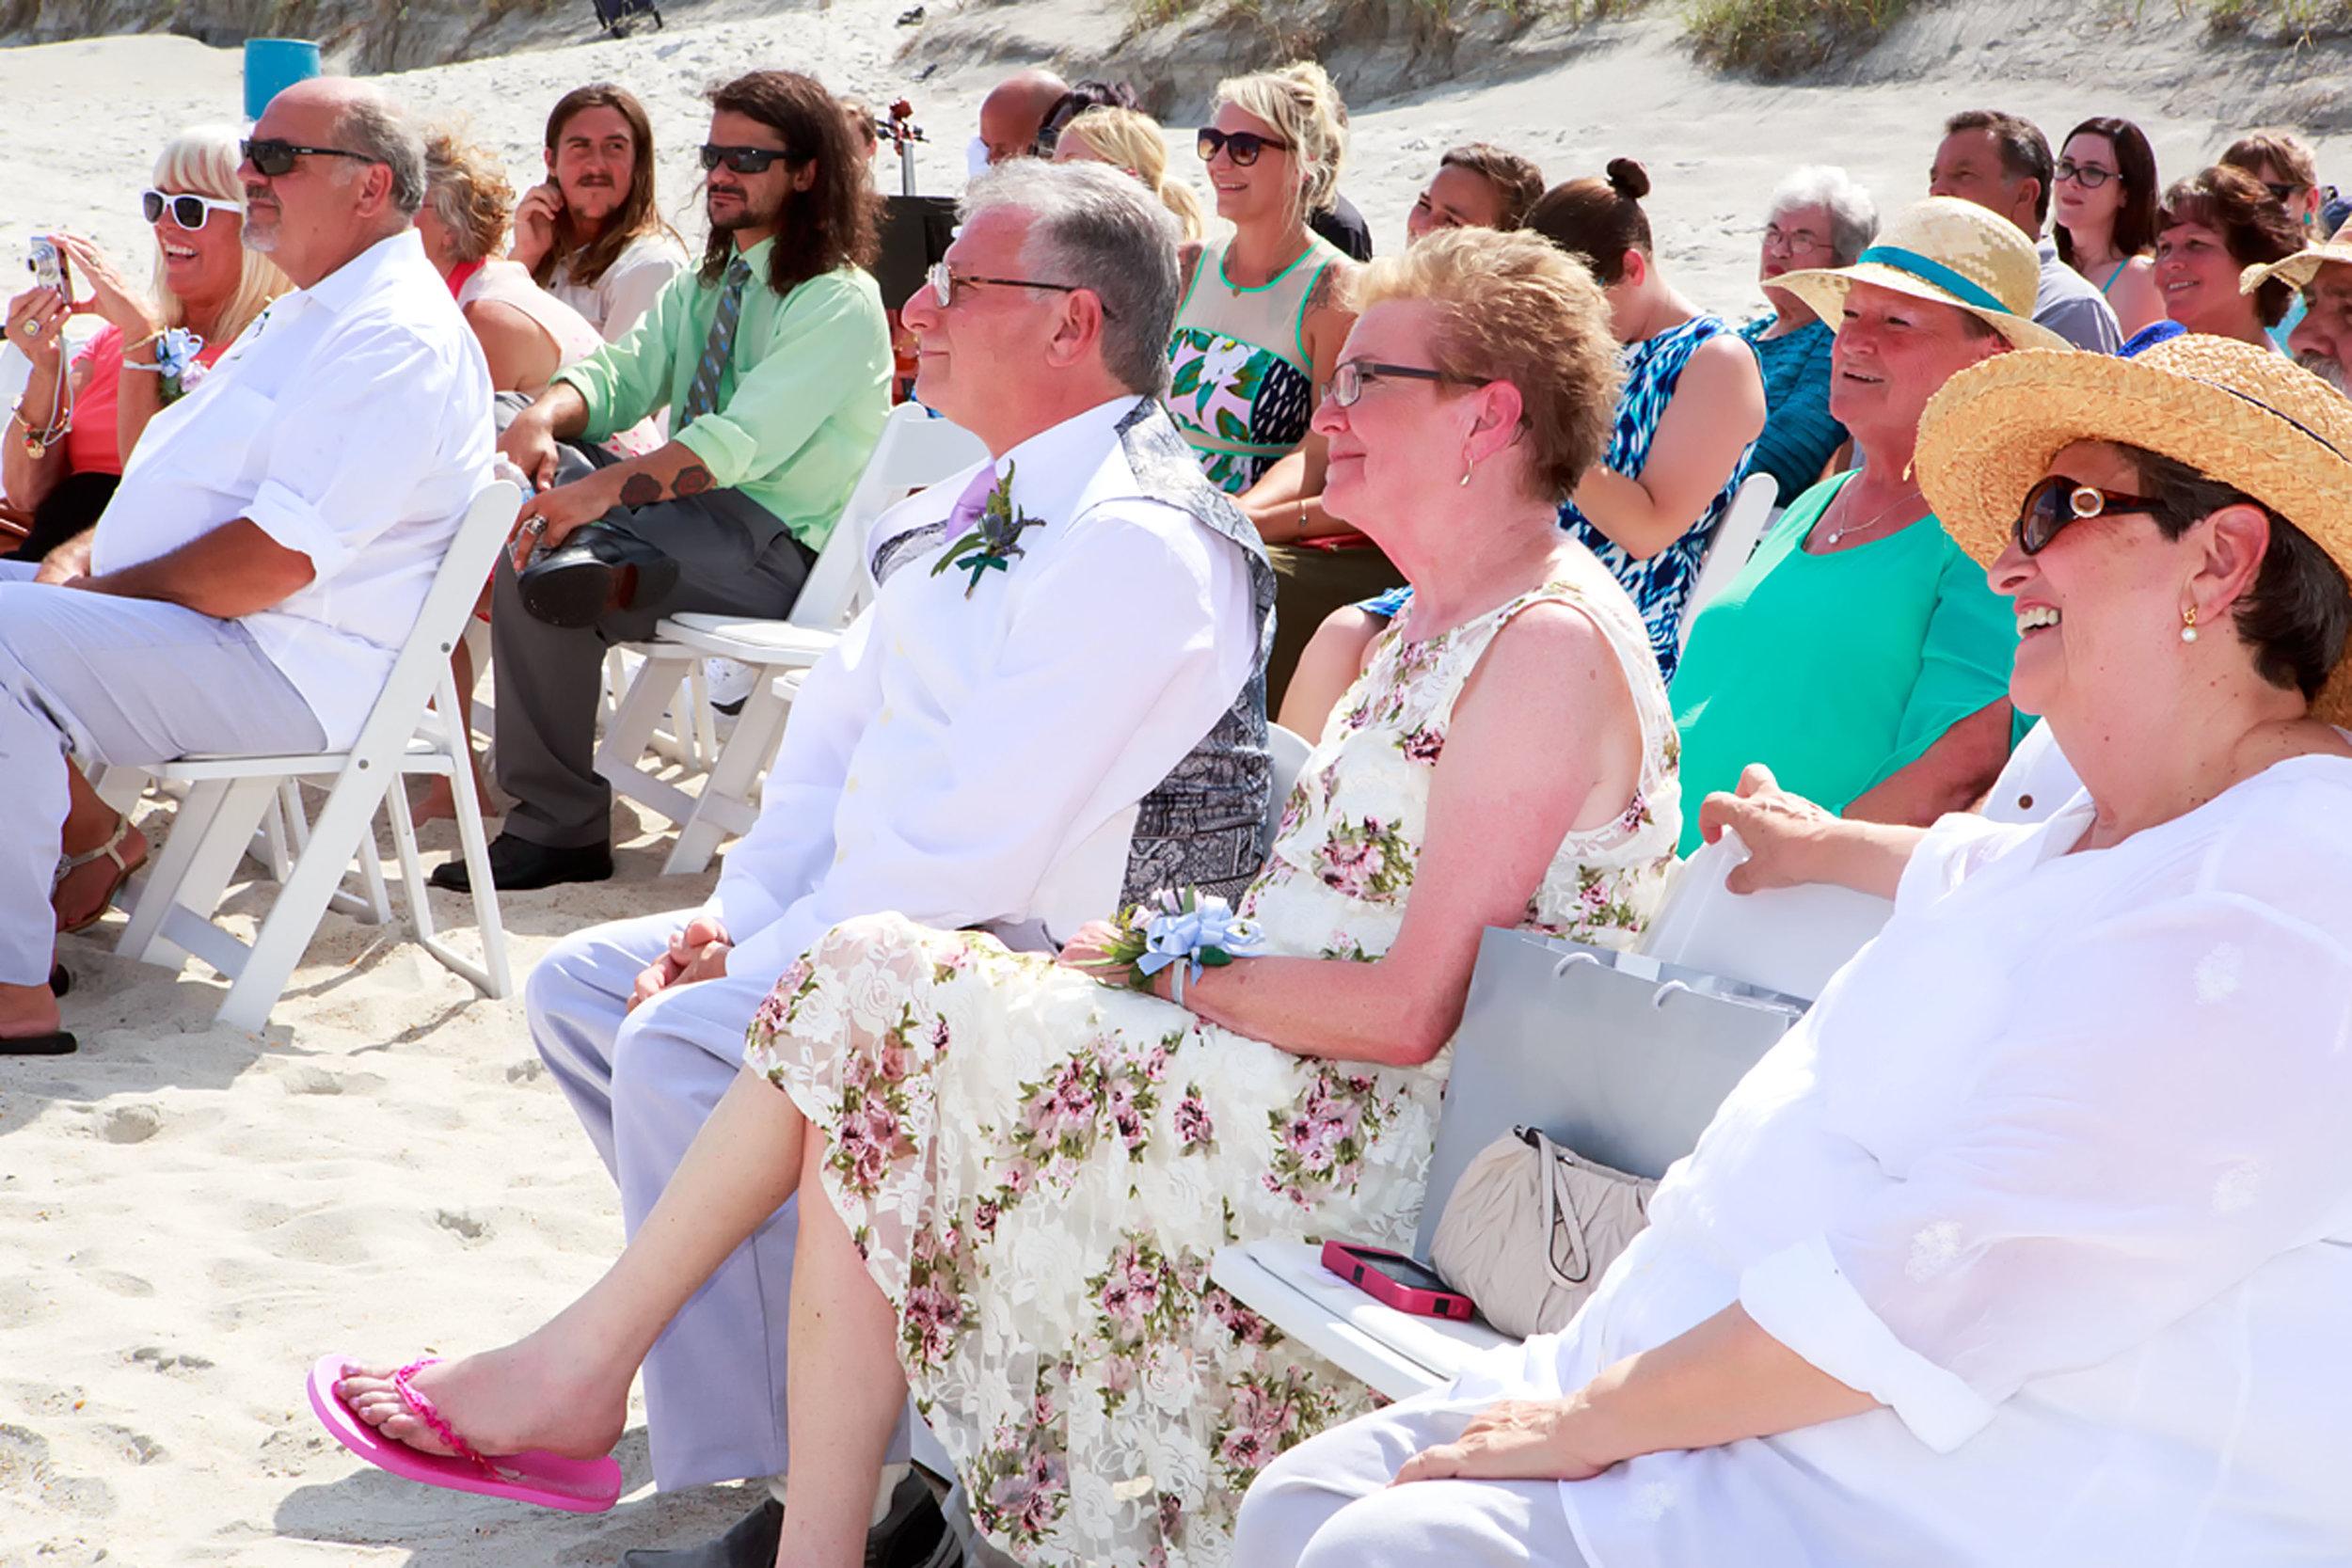 North_Carolina_Wedding_Photographer_Tiffany_Abruzzo_Ceremony_57.jpg